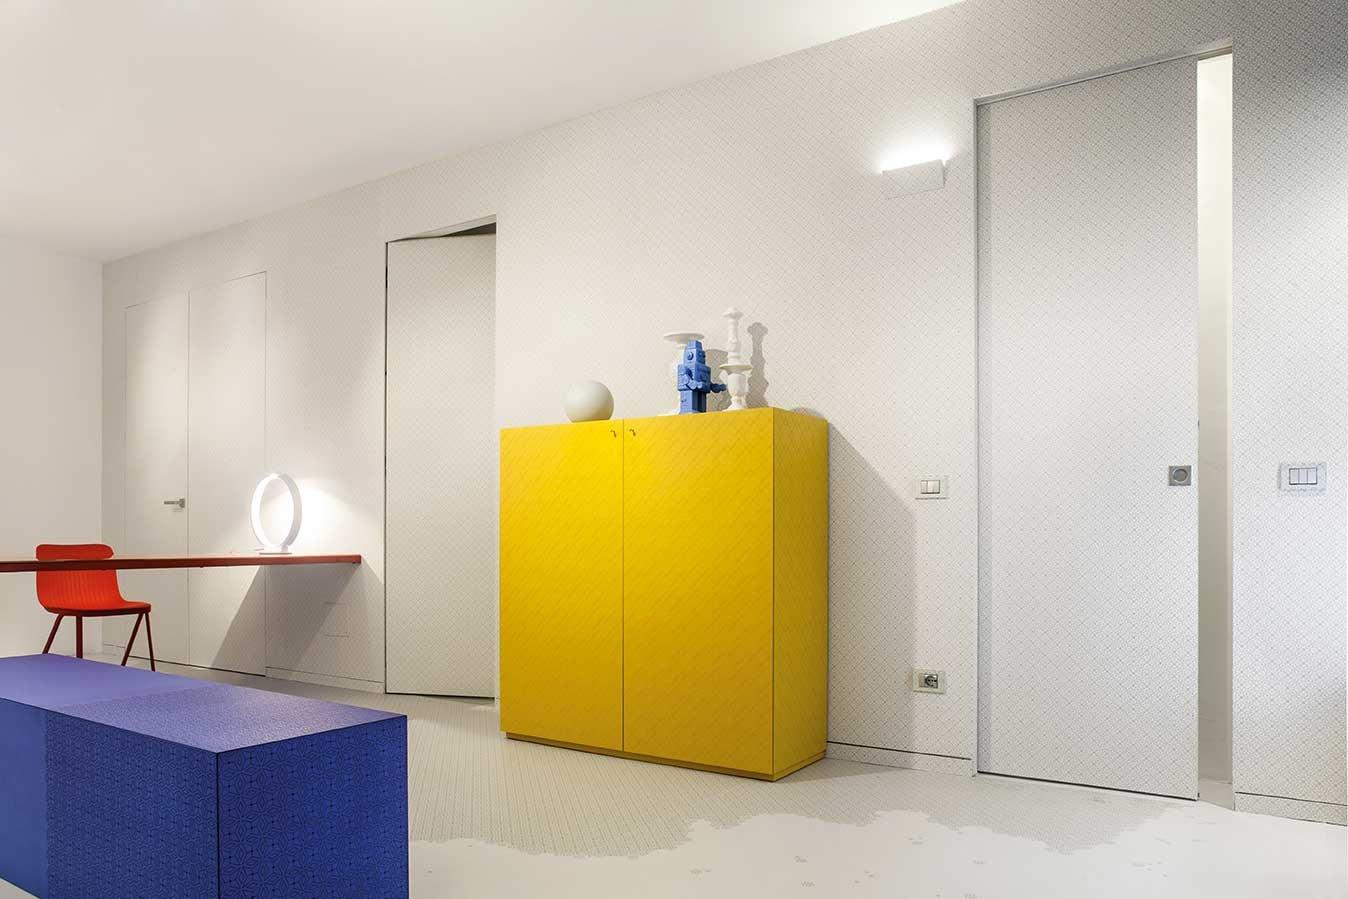 Pareti mobili per casa ig49 regardsdefemmes for Eclisse syntesis prezzo